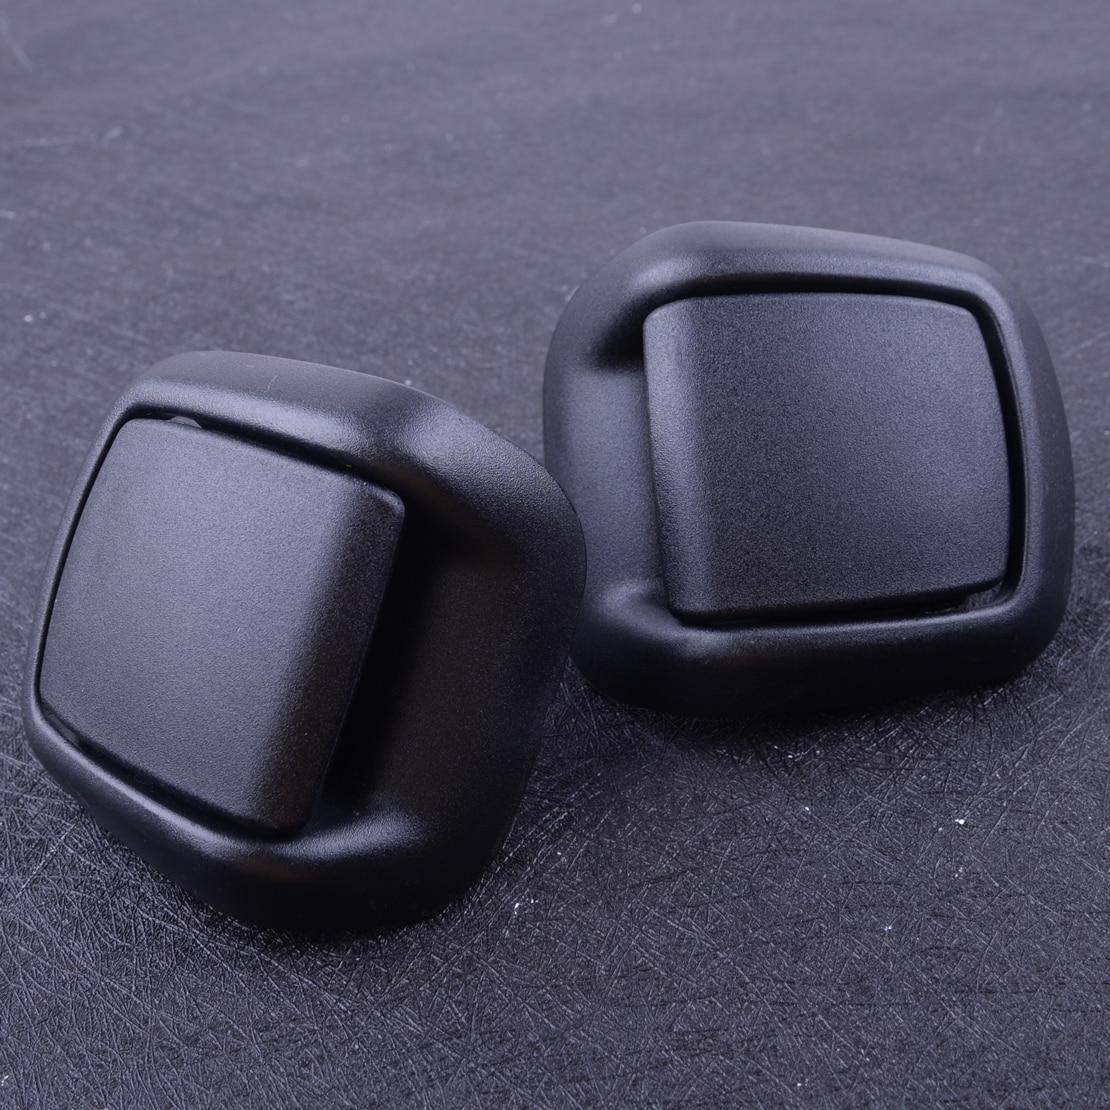 DWCX 1 Pair Car Front Right Left Seat Tilt Handle 1417520 1417521 Fit For Ford Fiesta MK6 VI 3 Door 2002 - 2005 2006 2007 2008